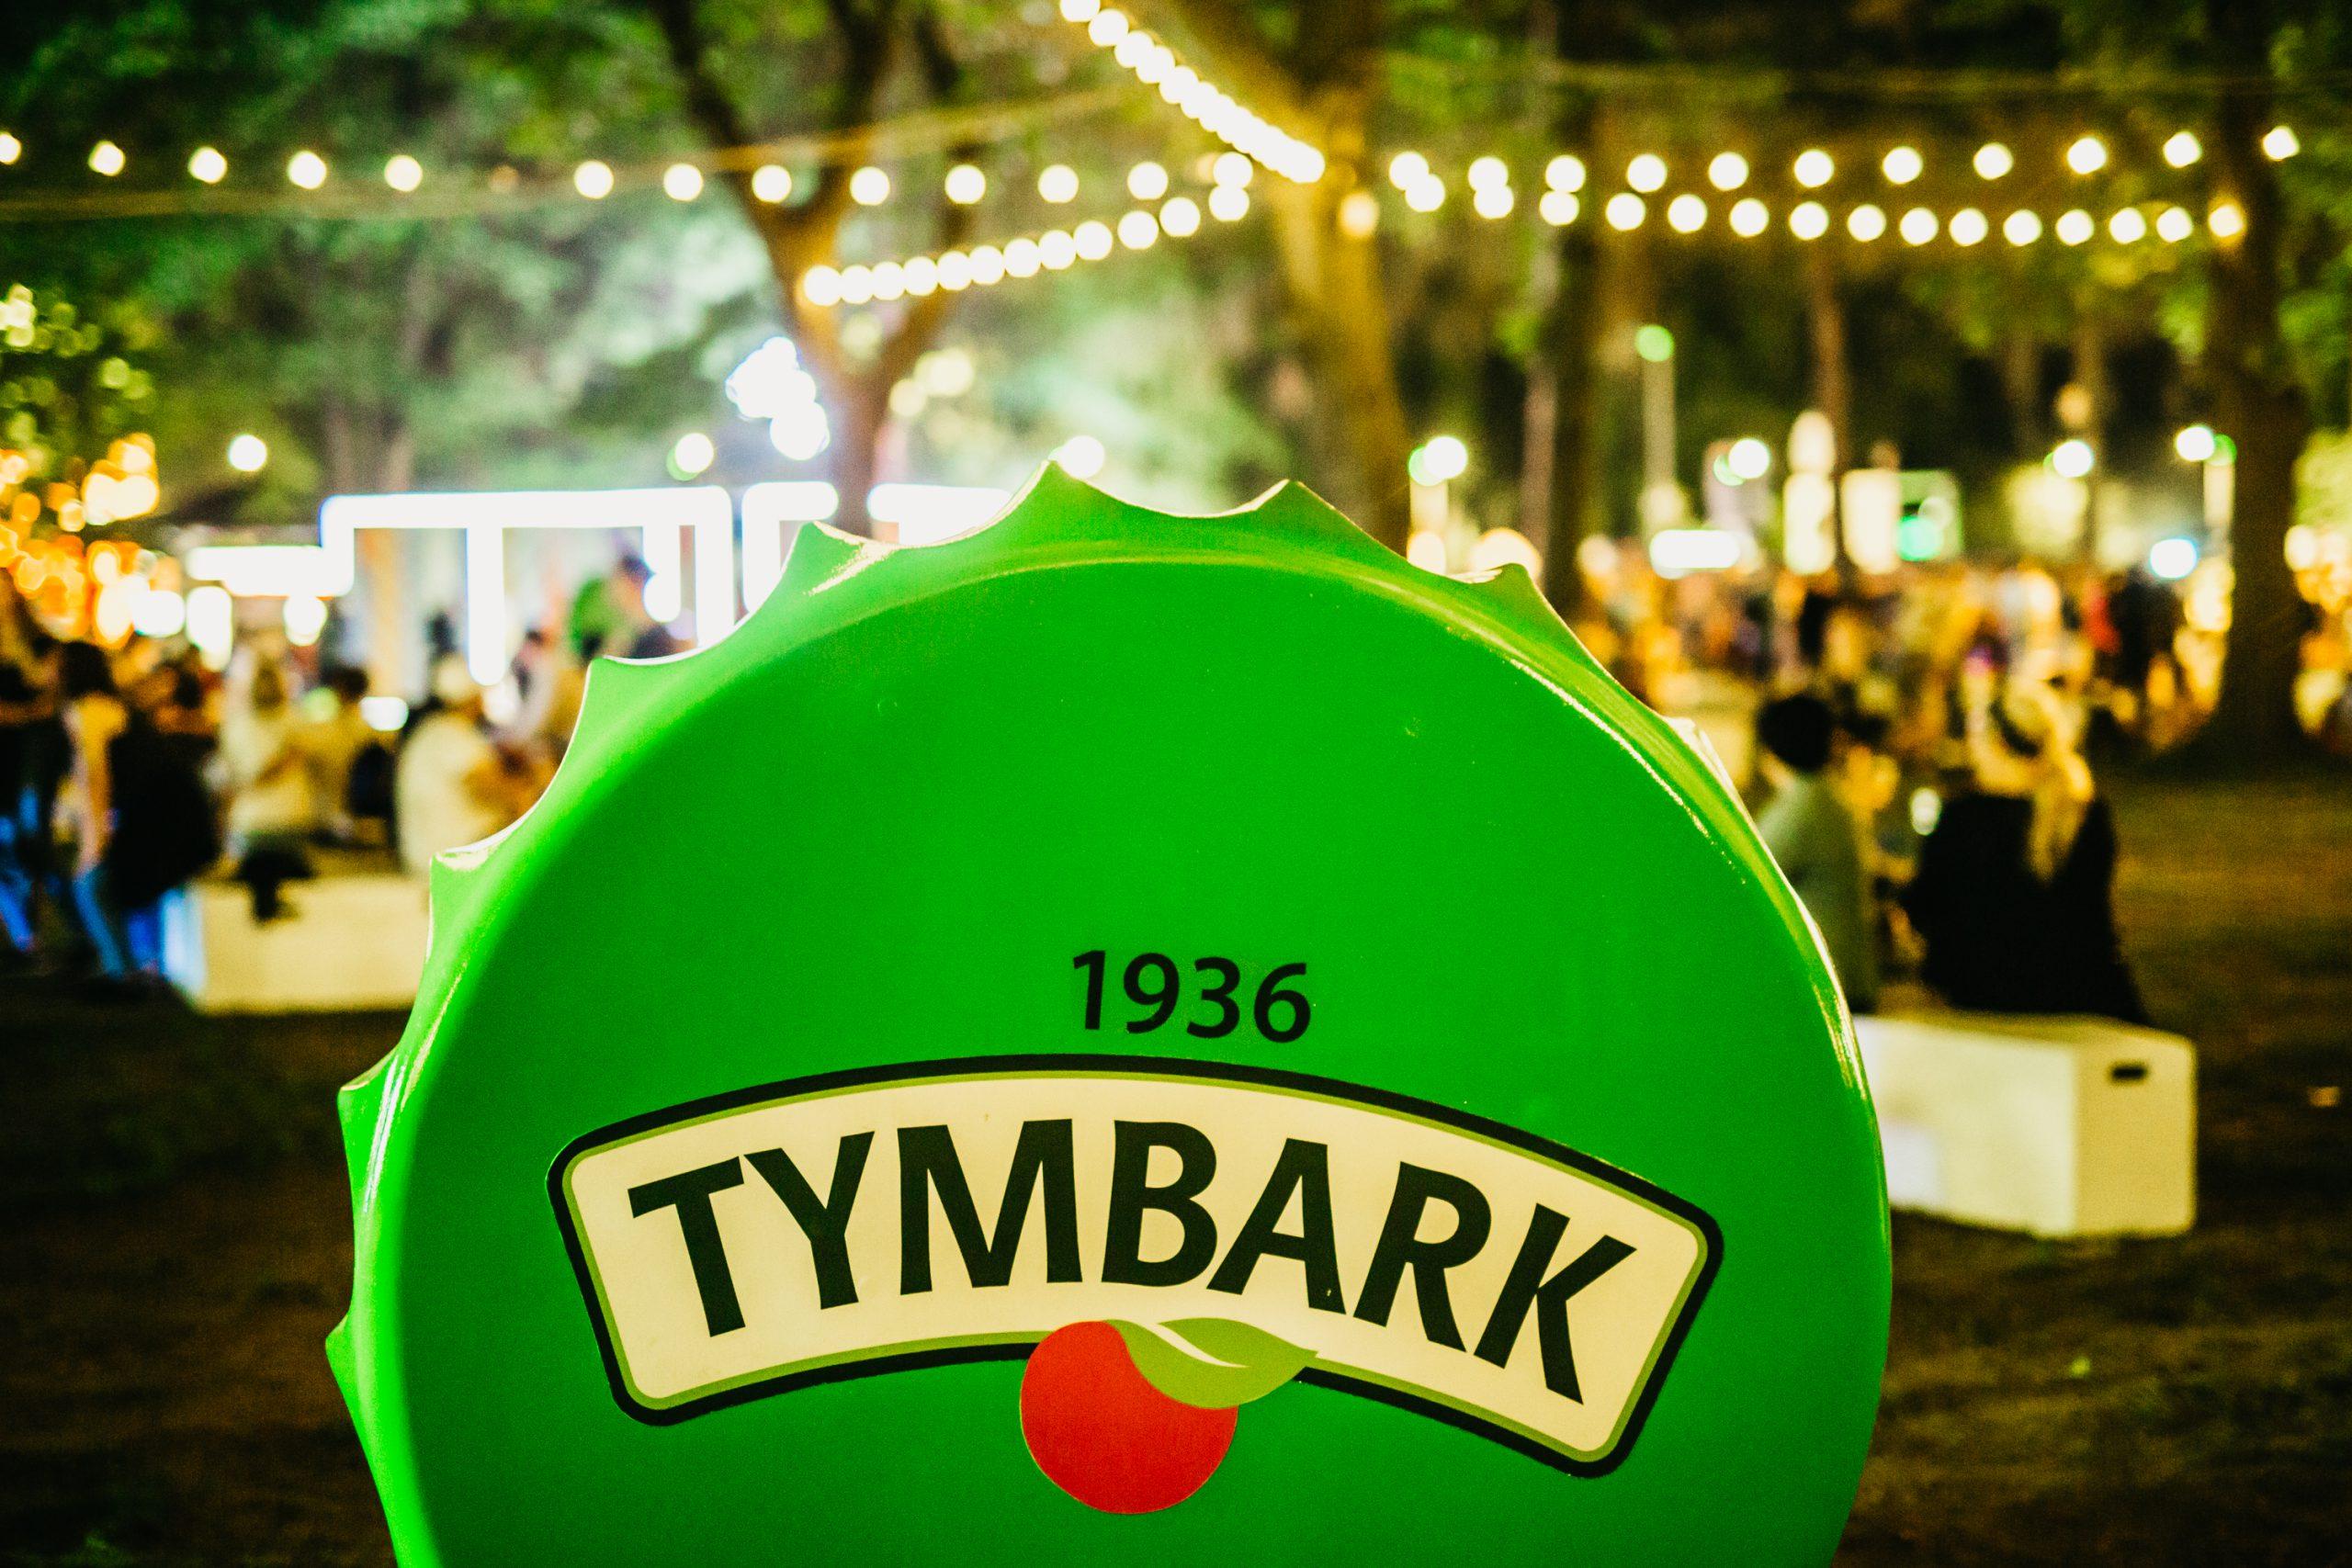 Tymbark jak co roku na letnich festiwalach